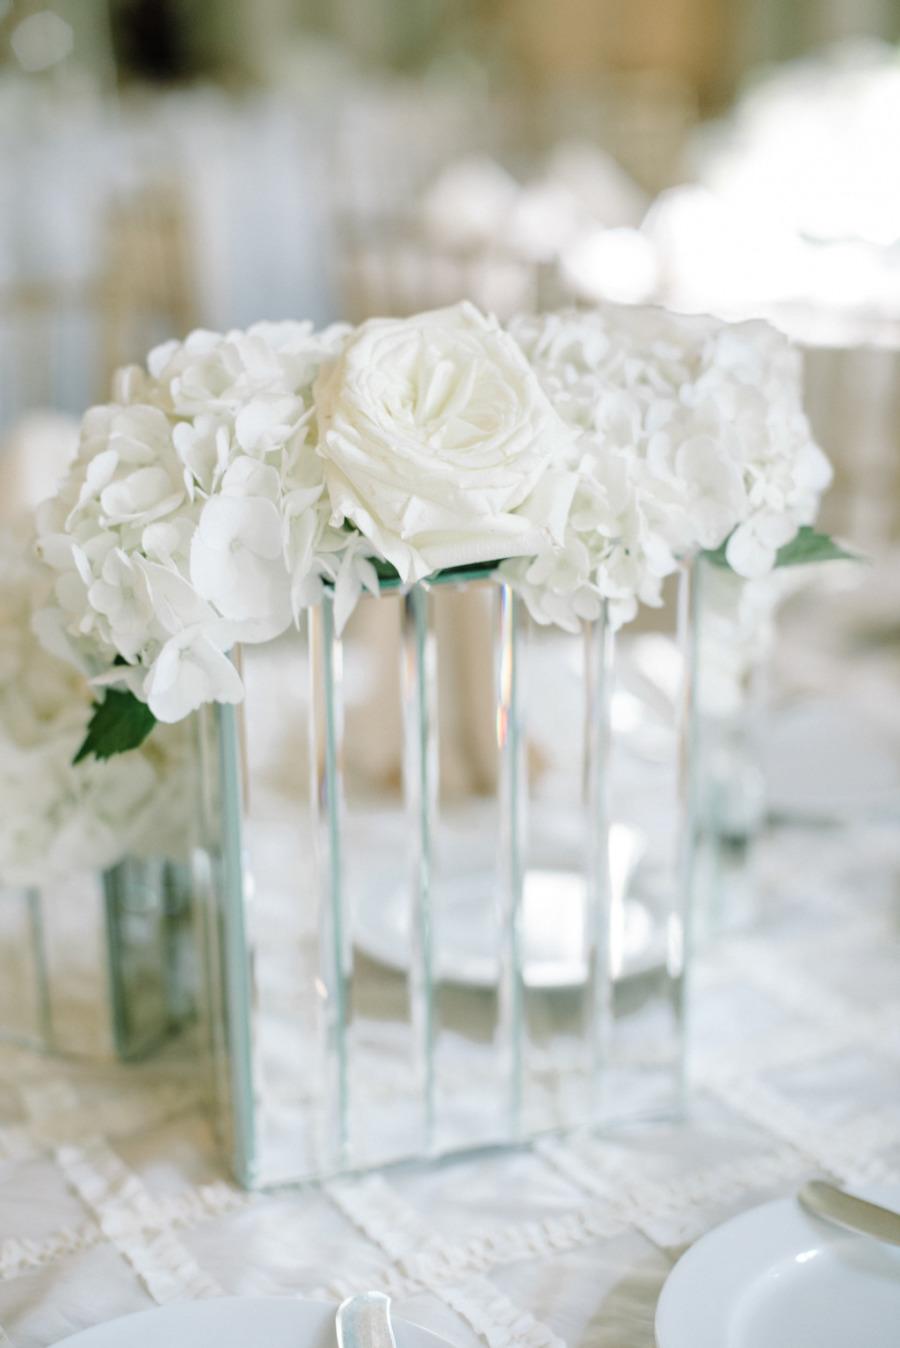 Perfect Wedding Vase Centerpieces Adornment - The Wedding Ideas ...